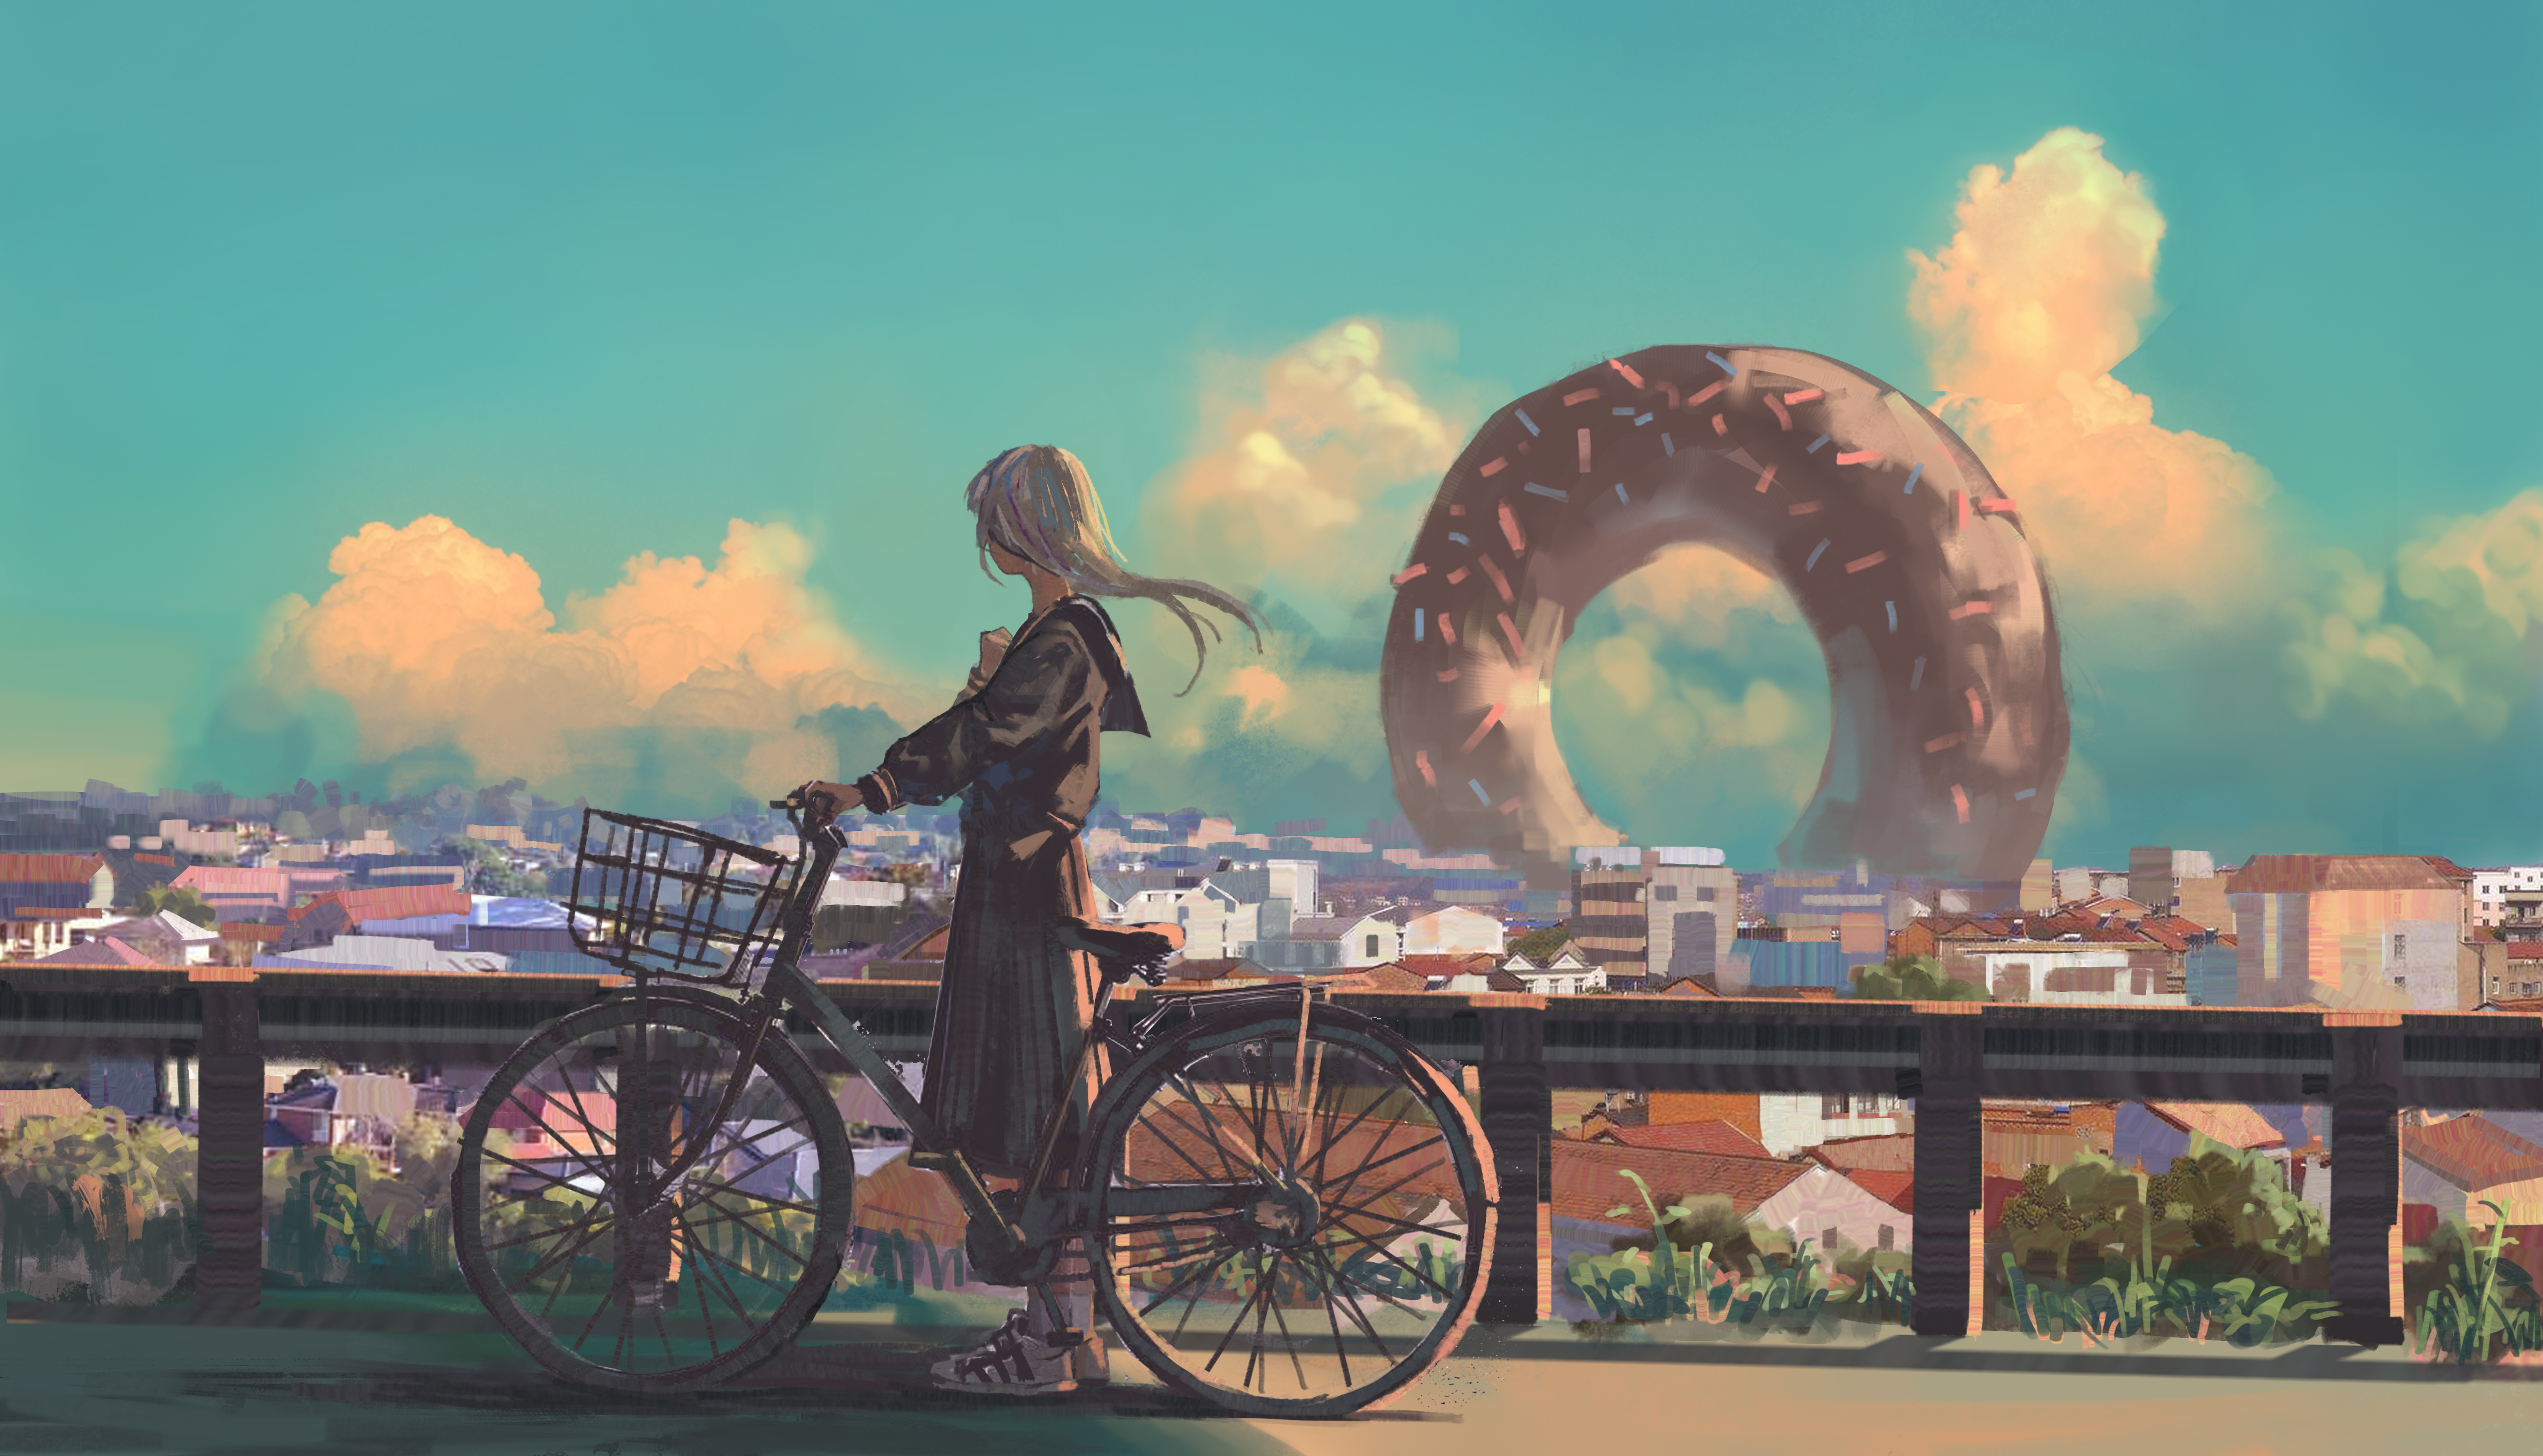 Anime 4094x2344 anime anime girls bicycle donut cityscape vehicle outdoors